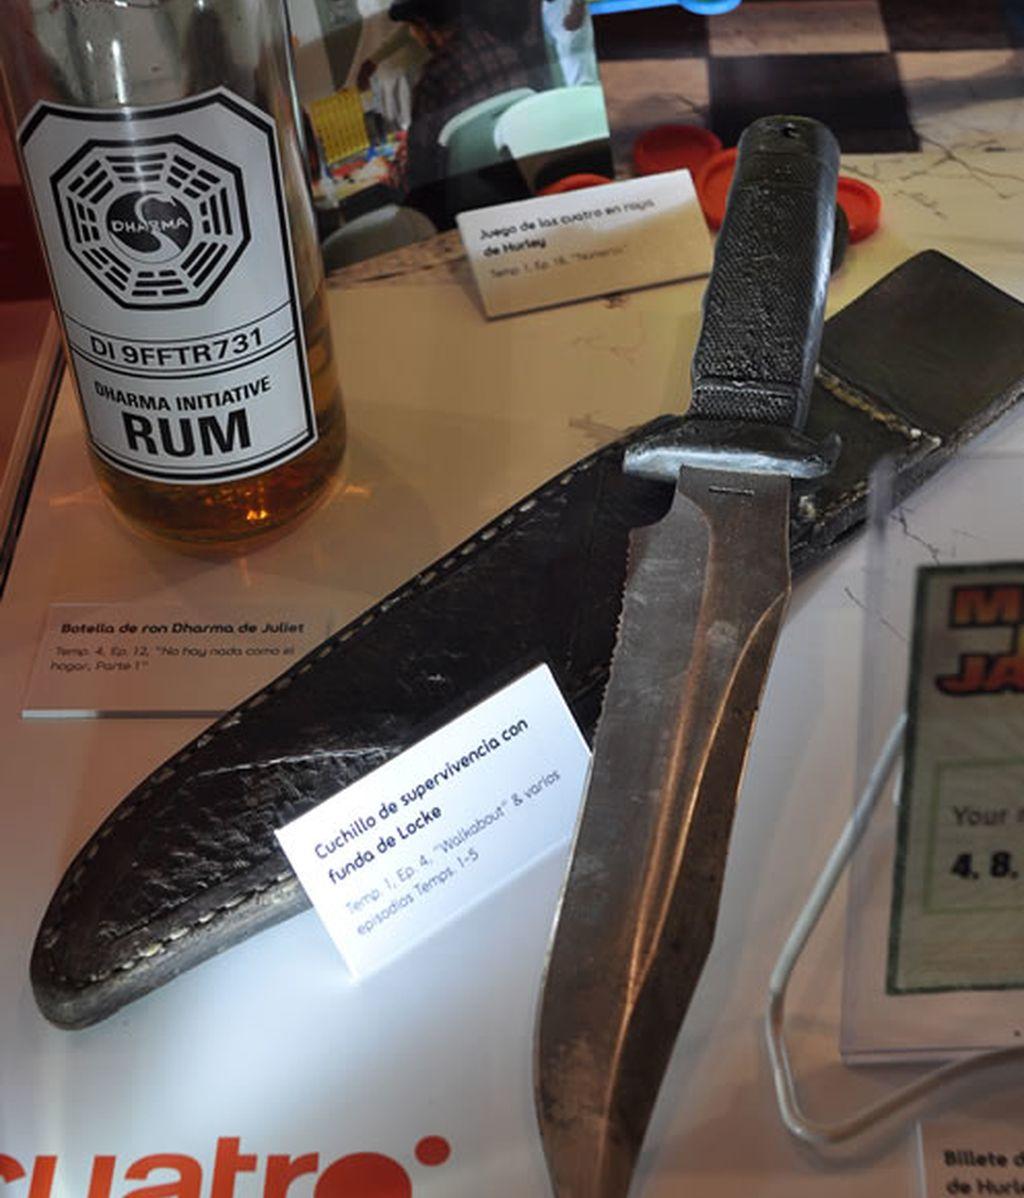 Cuchillo de Locke